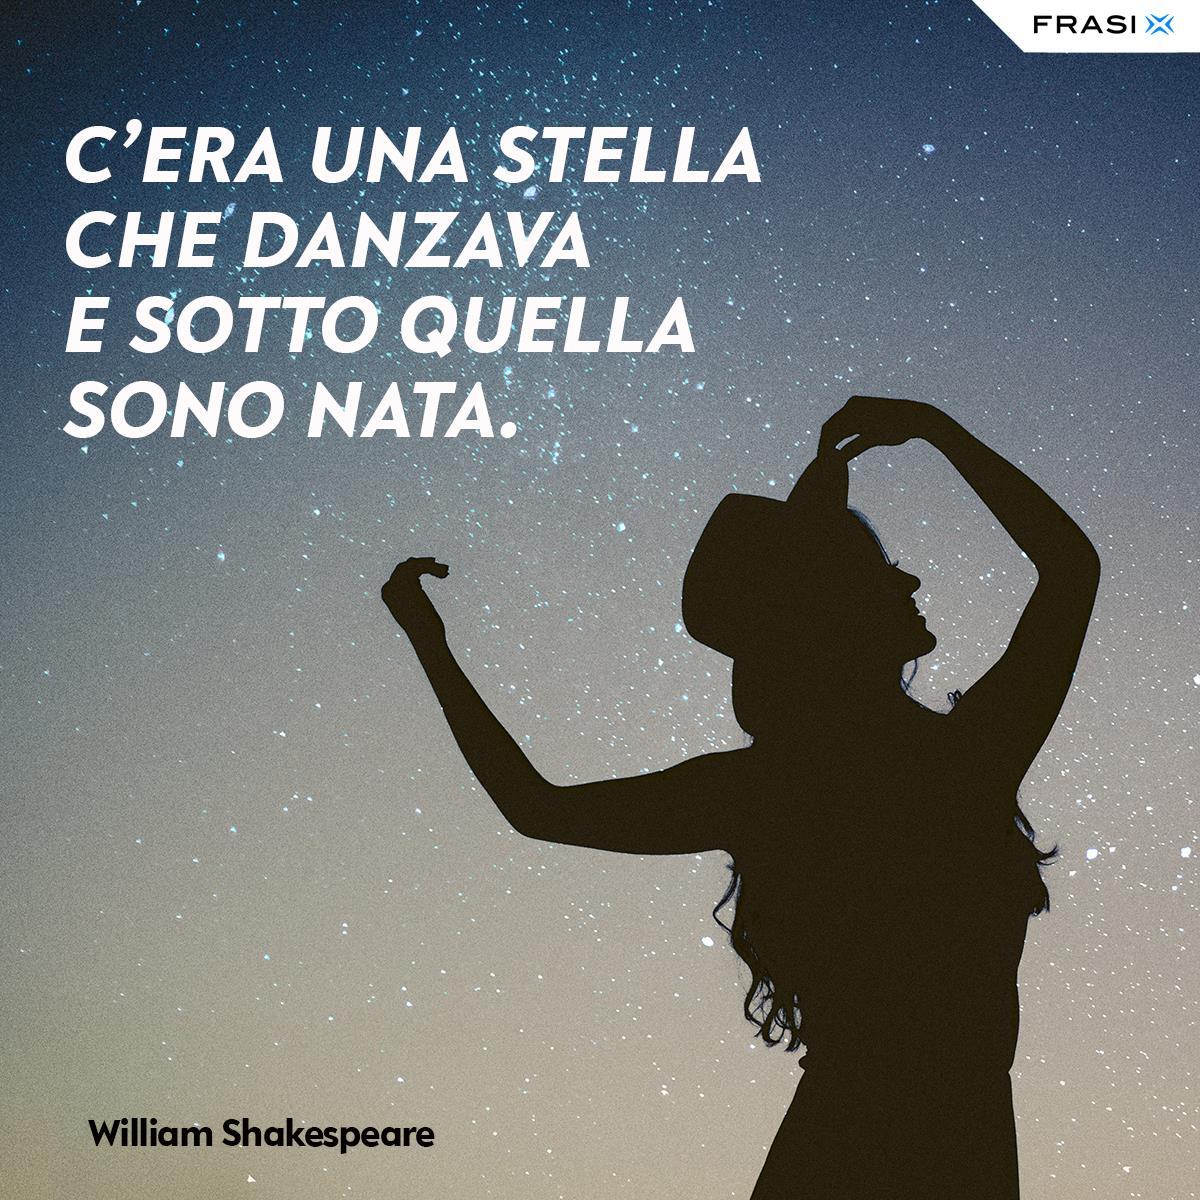 Frasi danza stella William Shakespeare